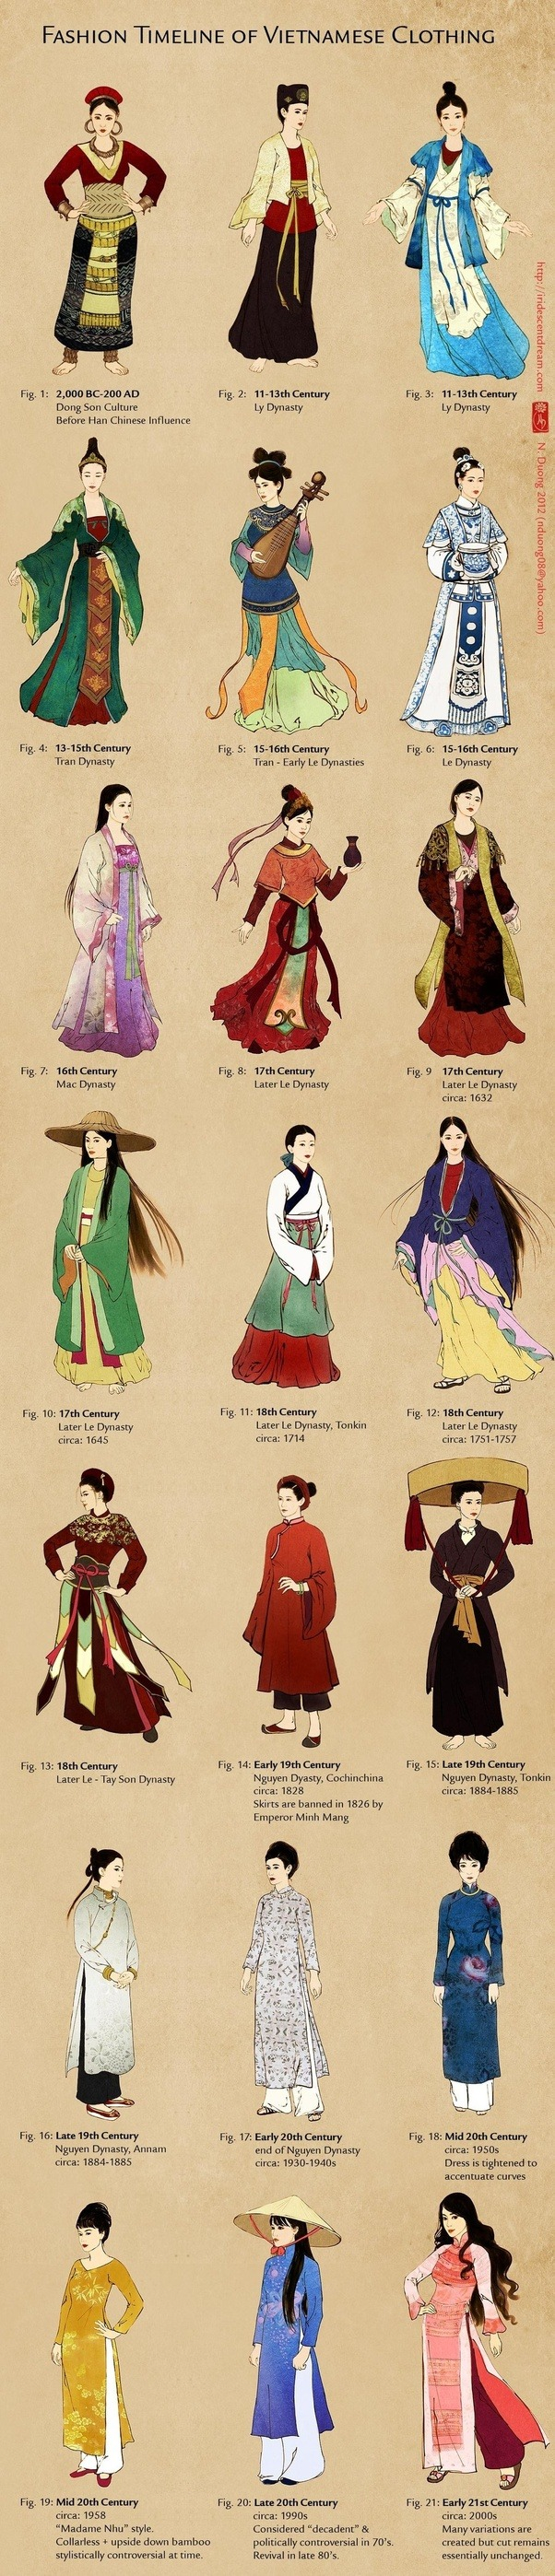 Ancient China Women Qing Fashion Timeline